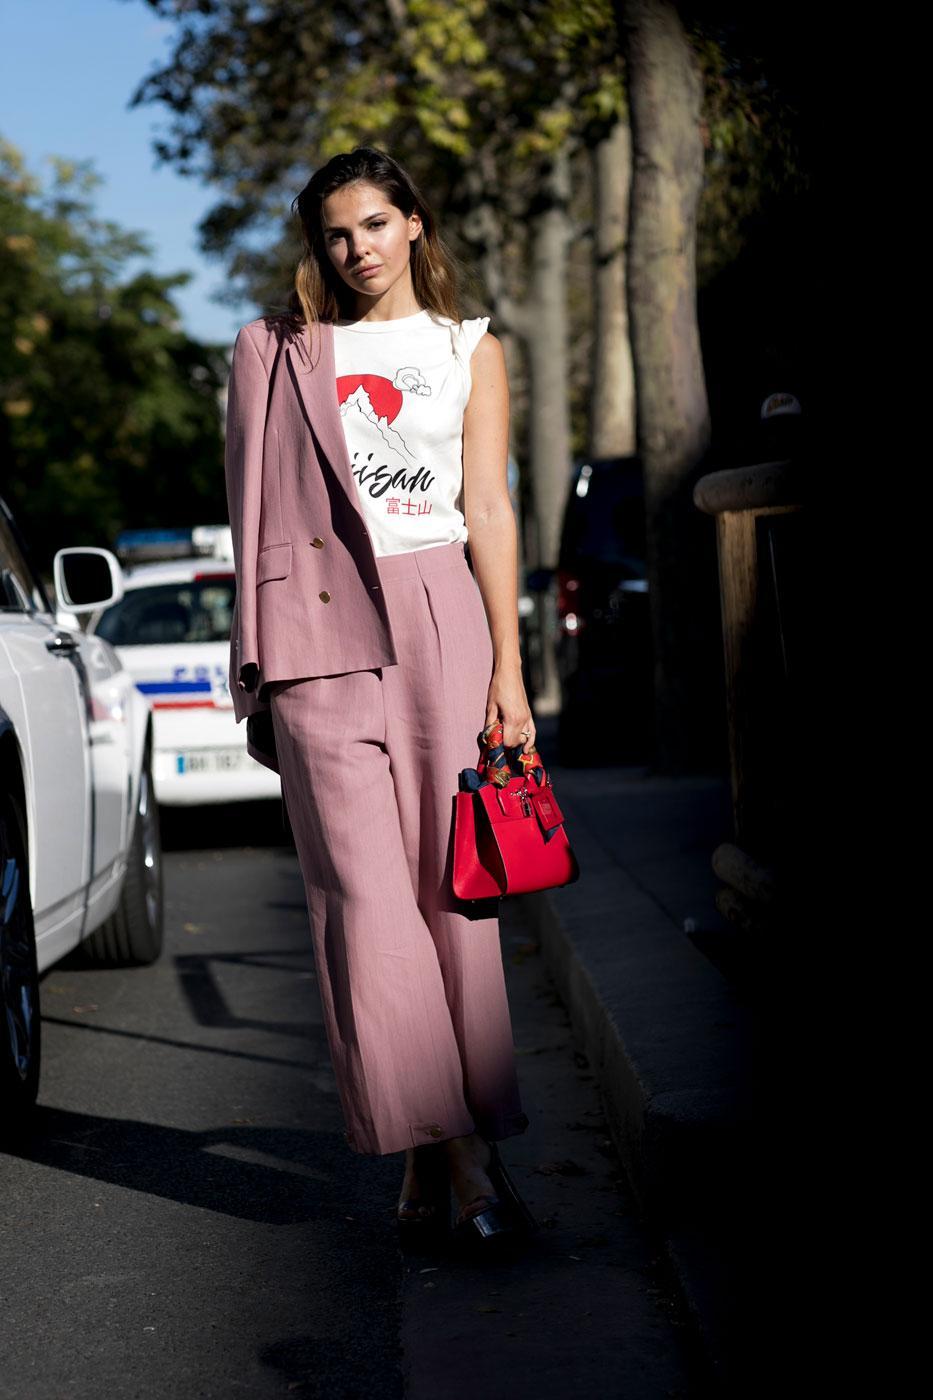 Street style 50 nuances d 39 automne la fashion week de paris madame figaro Style fashion week in la